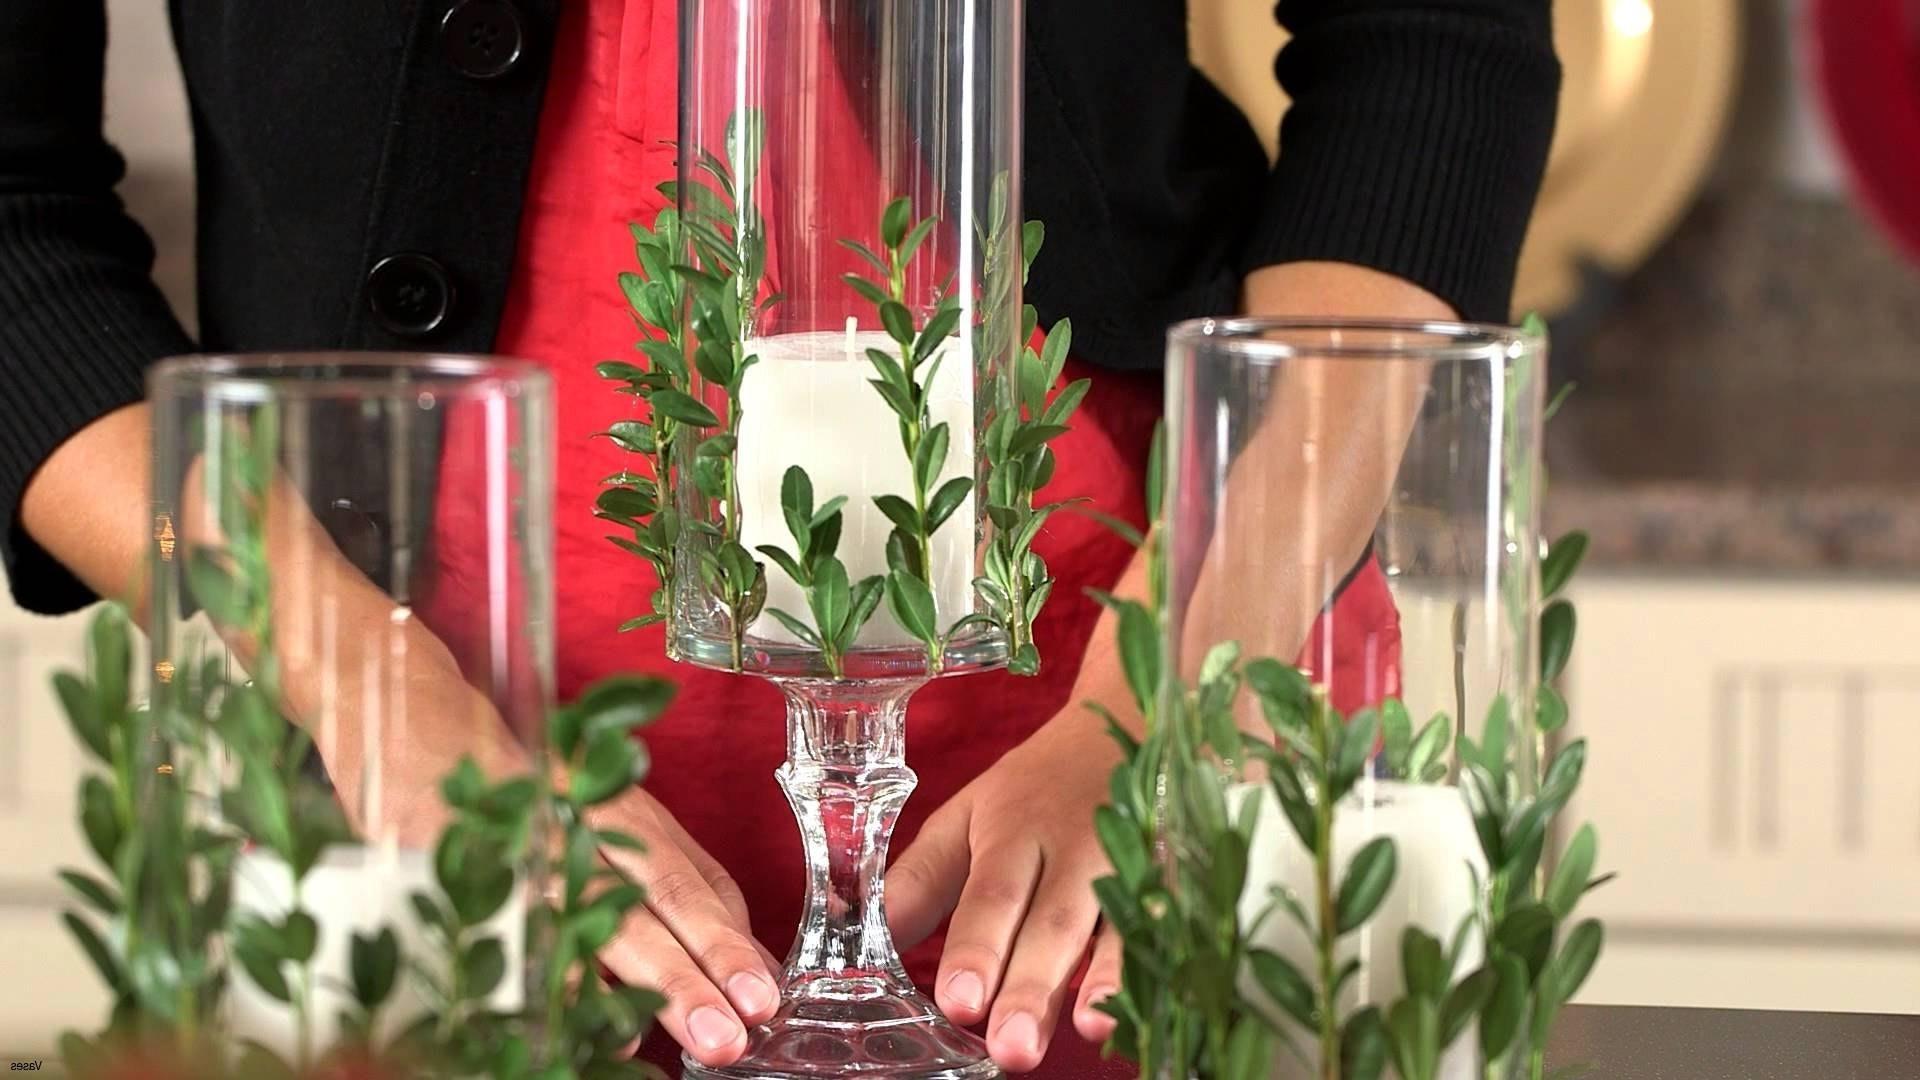 wholesale trumpet vases for weddings of 18 new wedding centerpiece decoration ideas italib net pertaining to dollar tree wedding decorations awesome h vases dollar vase i 0d inspiration wedding centerpiece vases